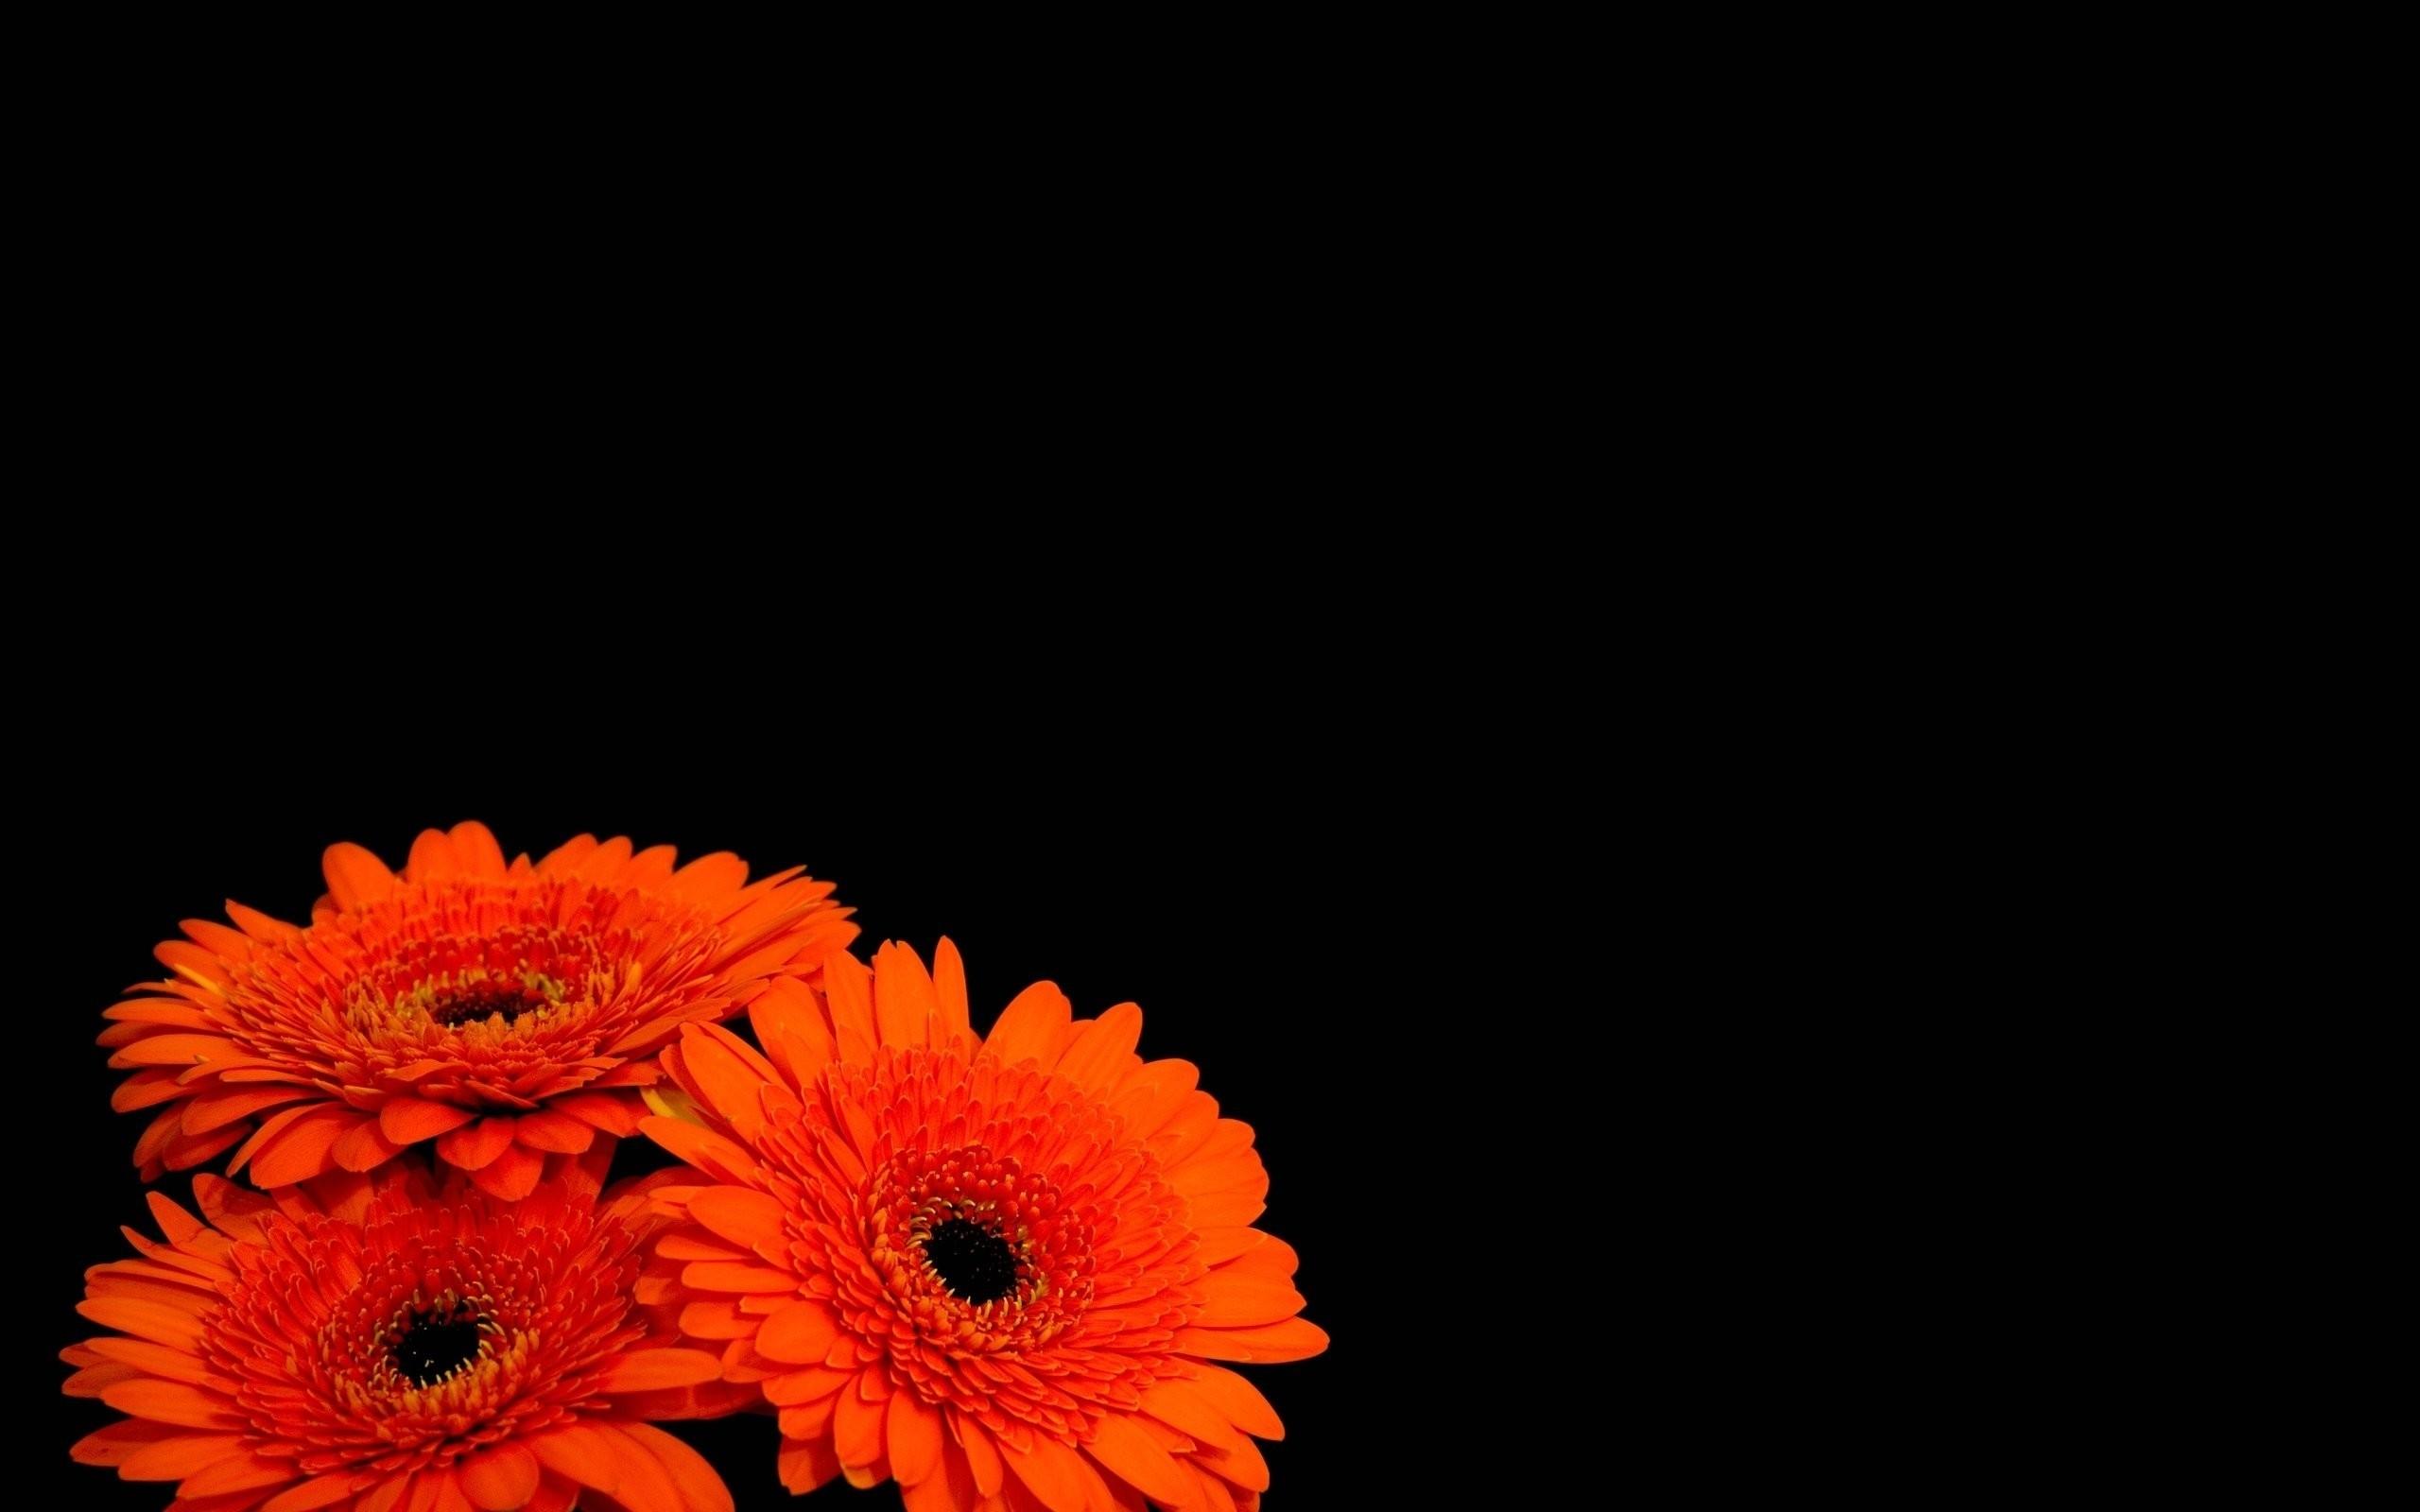 Flowers black background orange flowers wallpaper